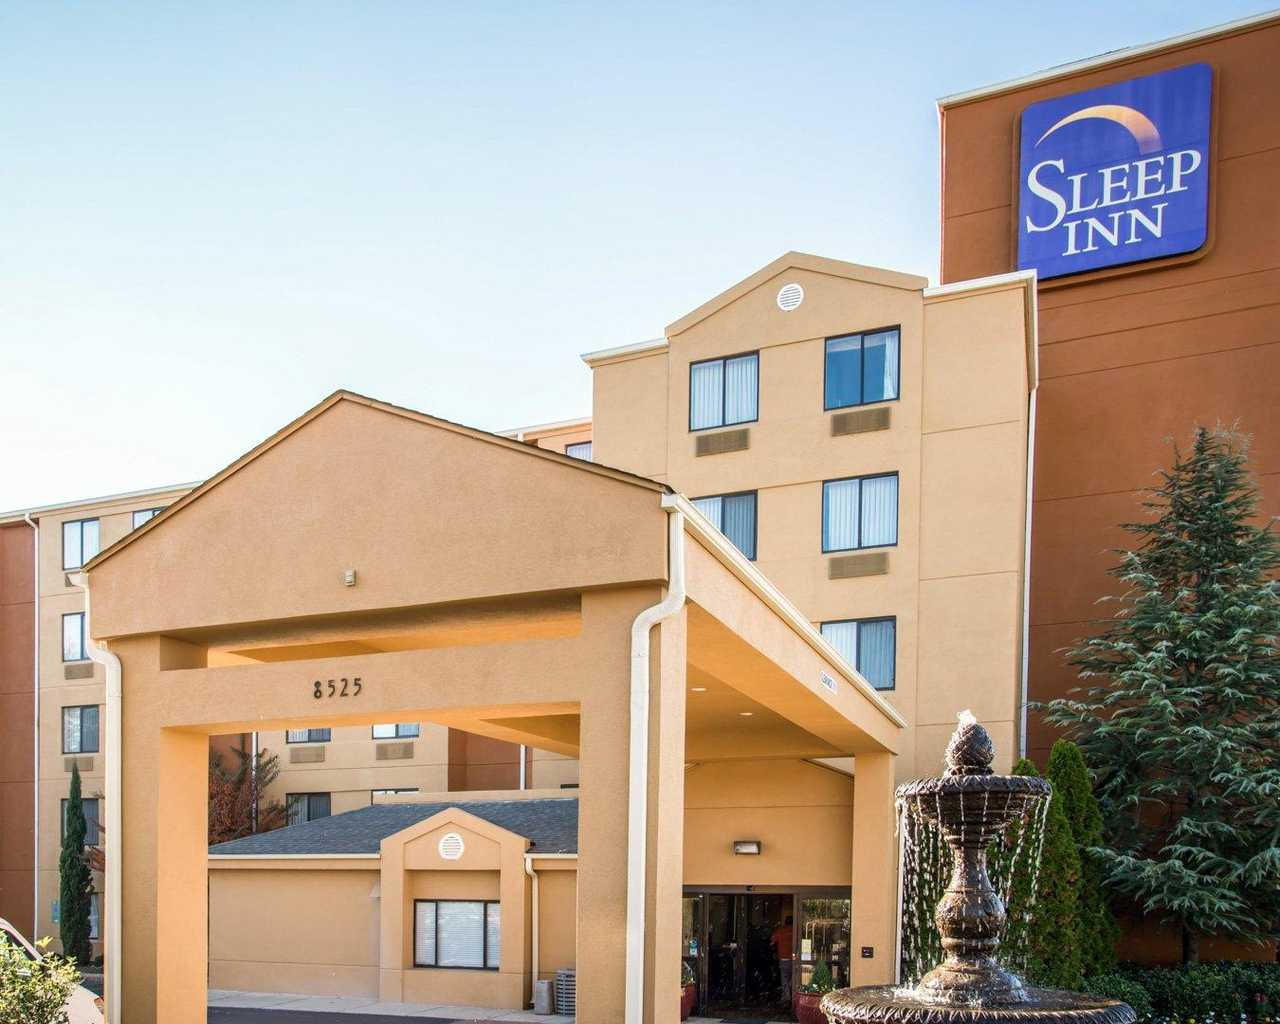 Sleep Inn University Place Charlotte - Exterior-2